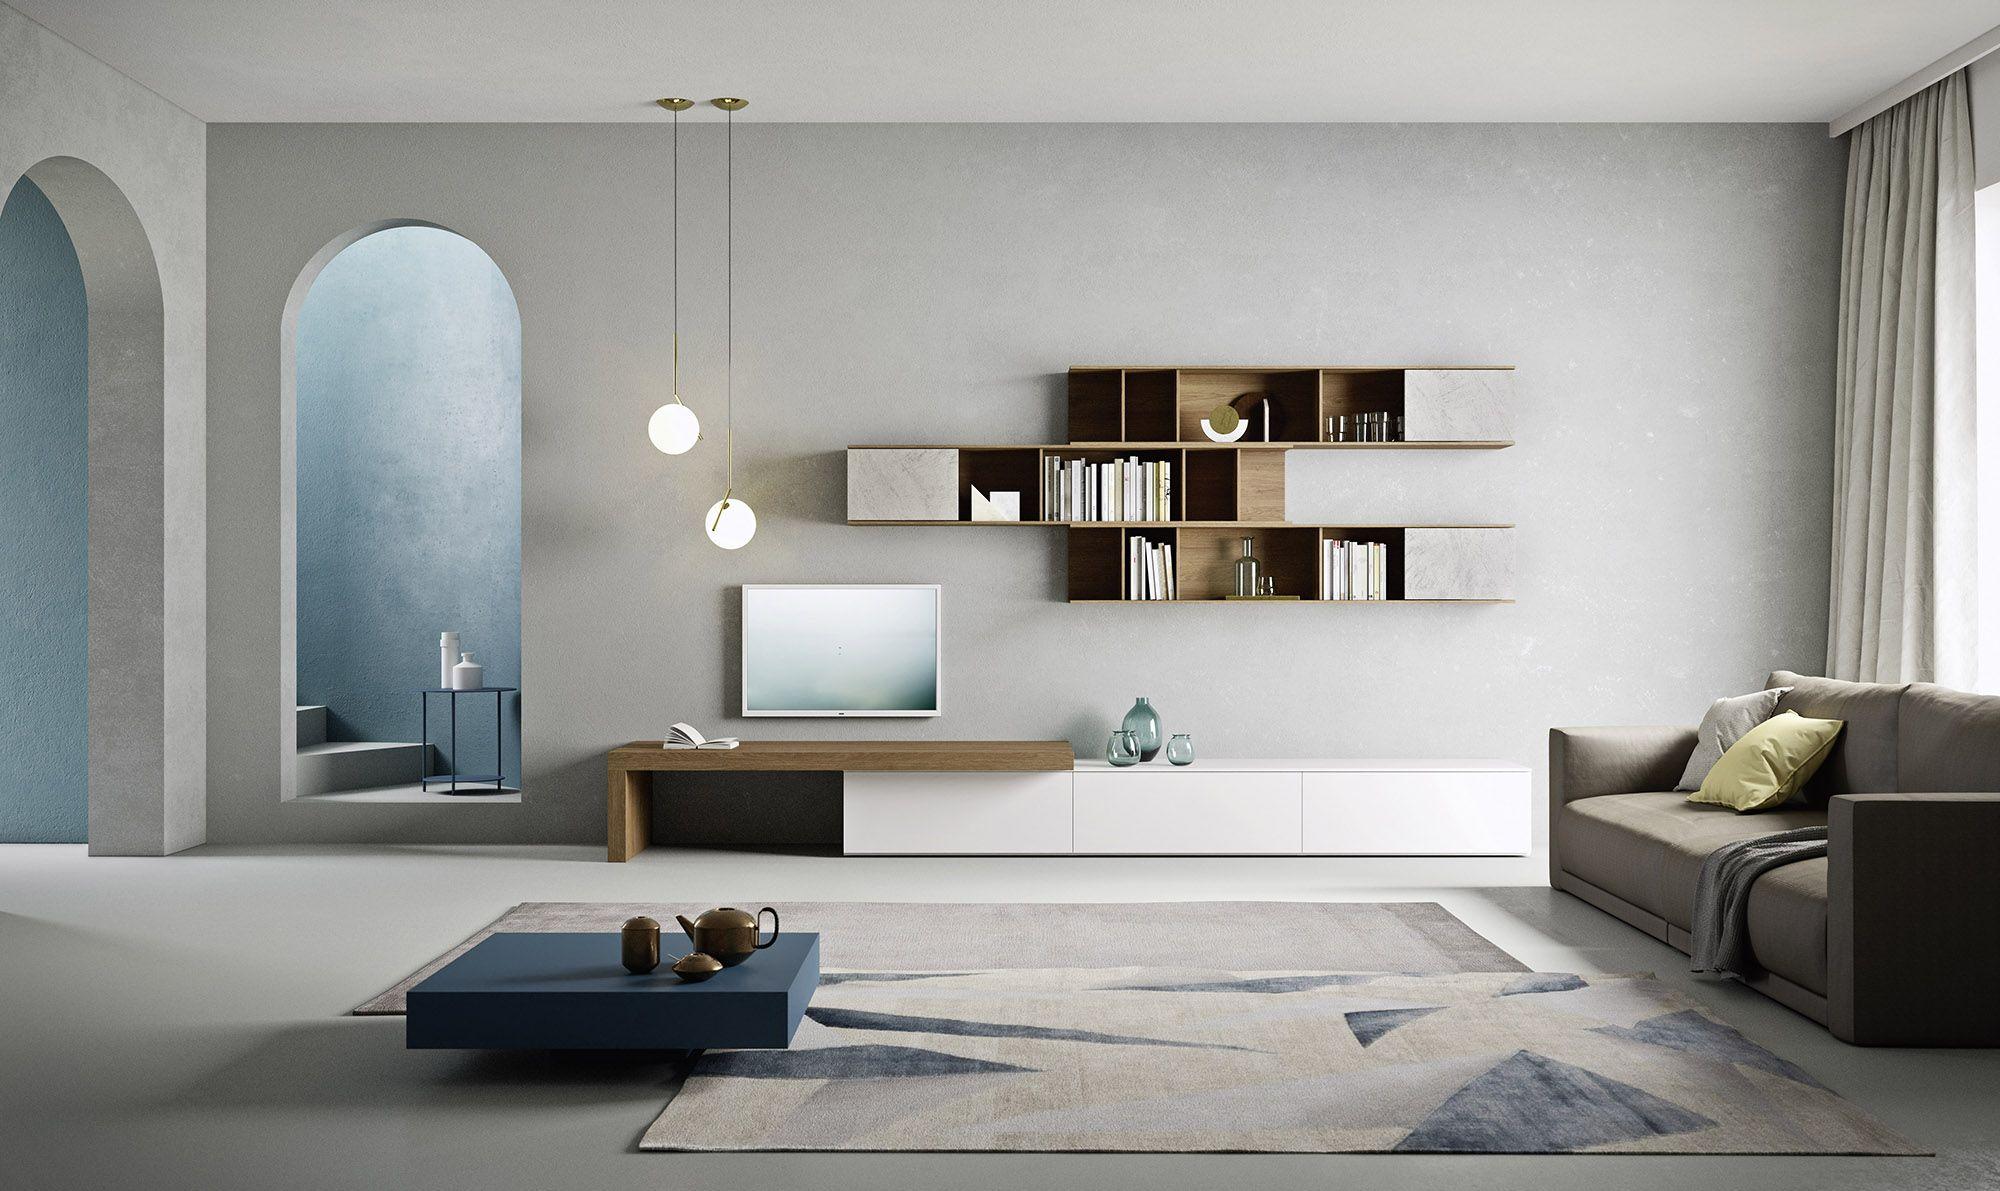 Wohnwände | Tv walls, Condos and Salons